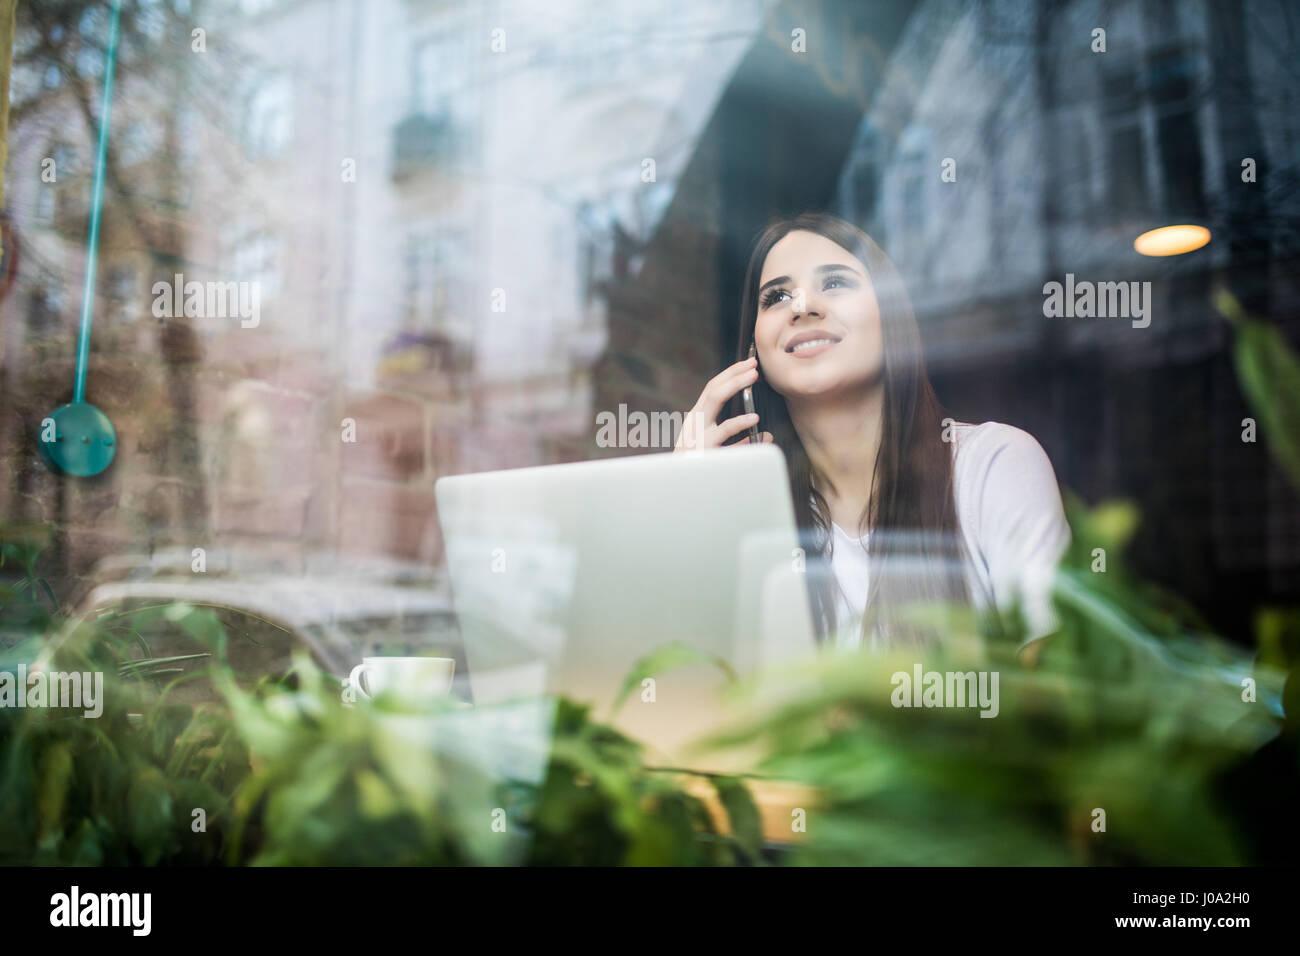 Junge Frau am Telefon in Coffee-shop Stockbild